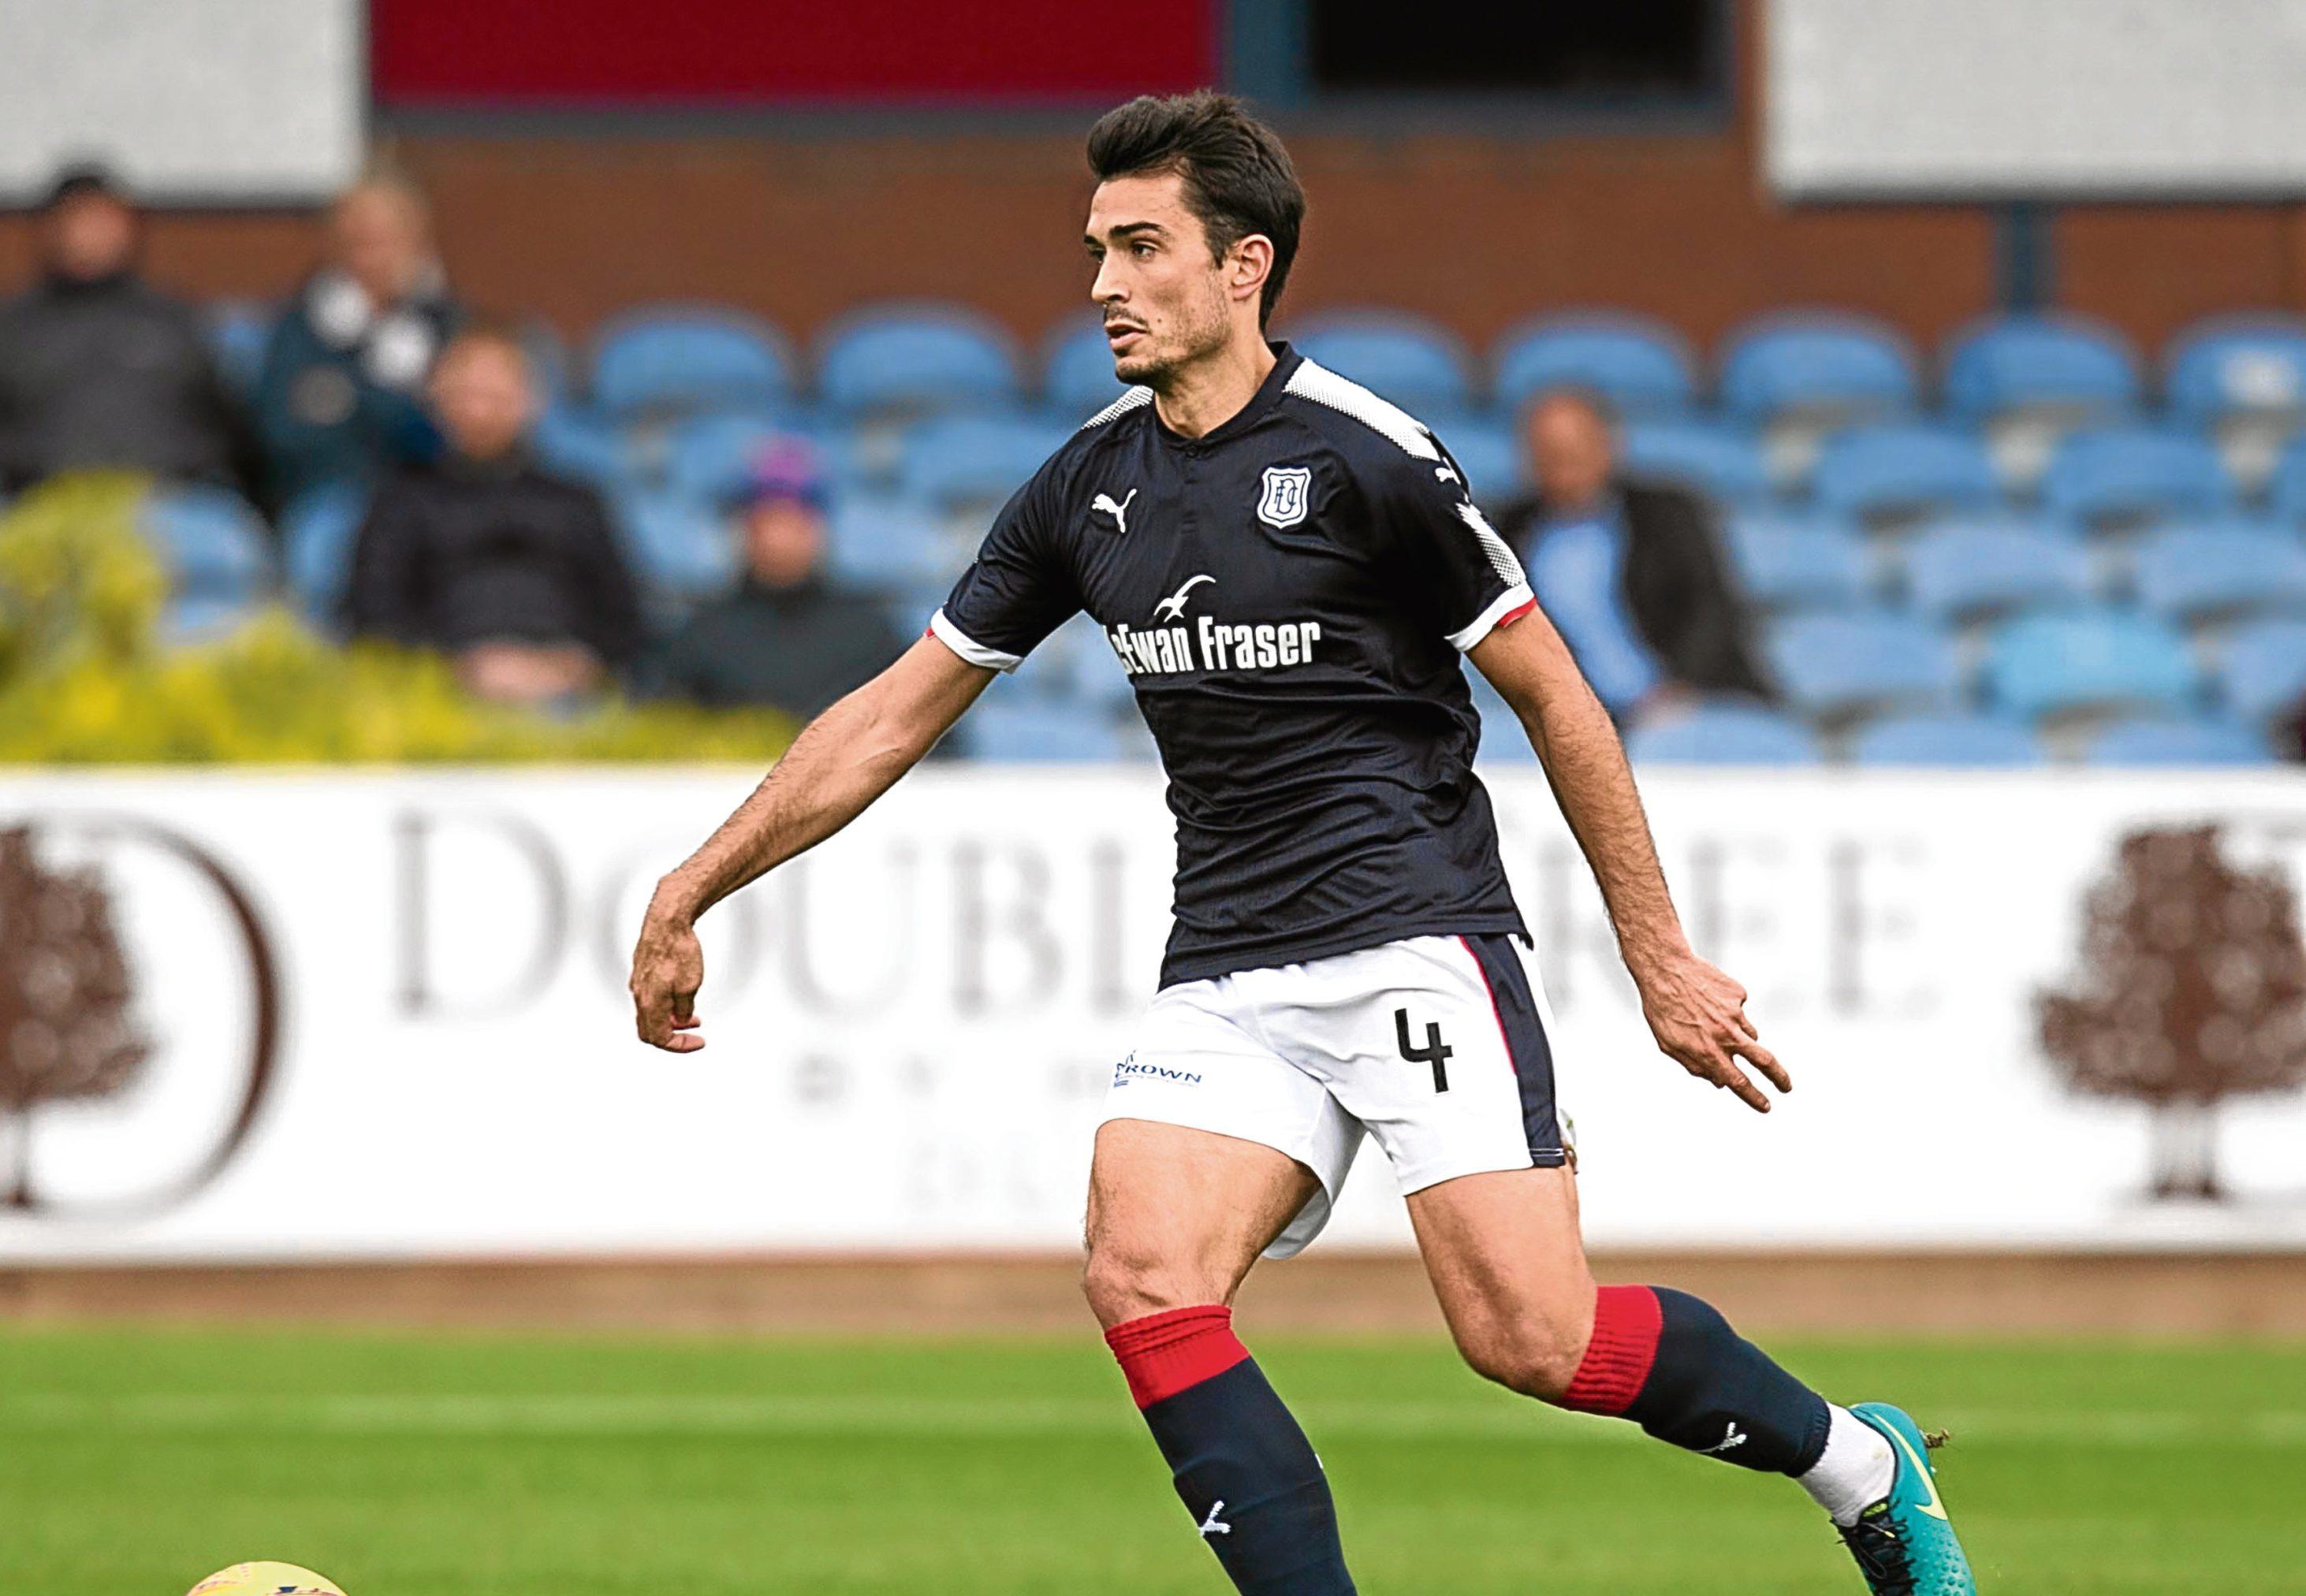 Defender Julen Etxabeguren could return to Scottish football at Inverness